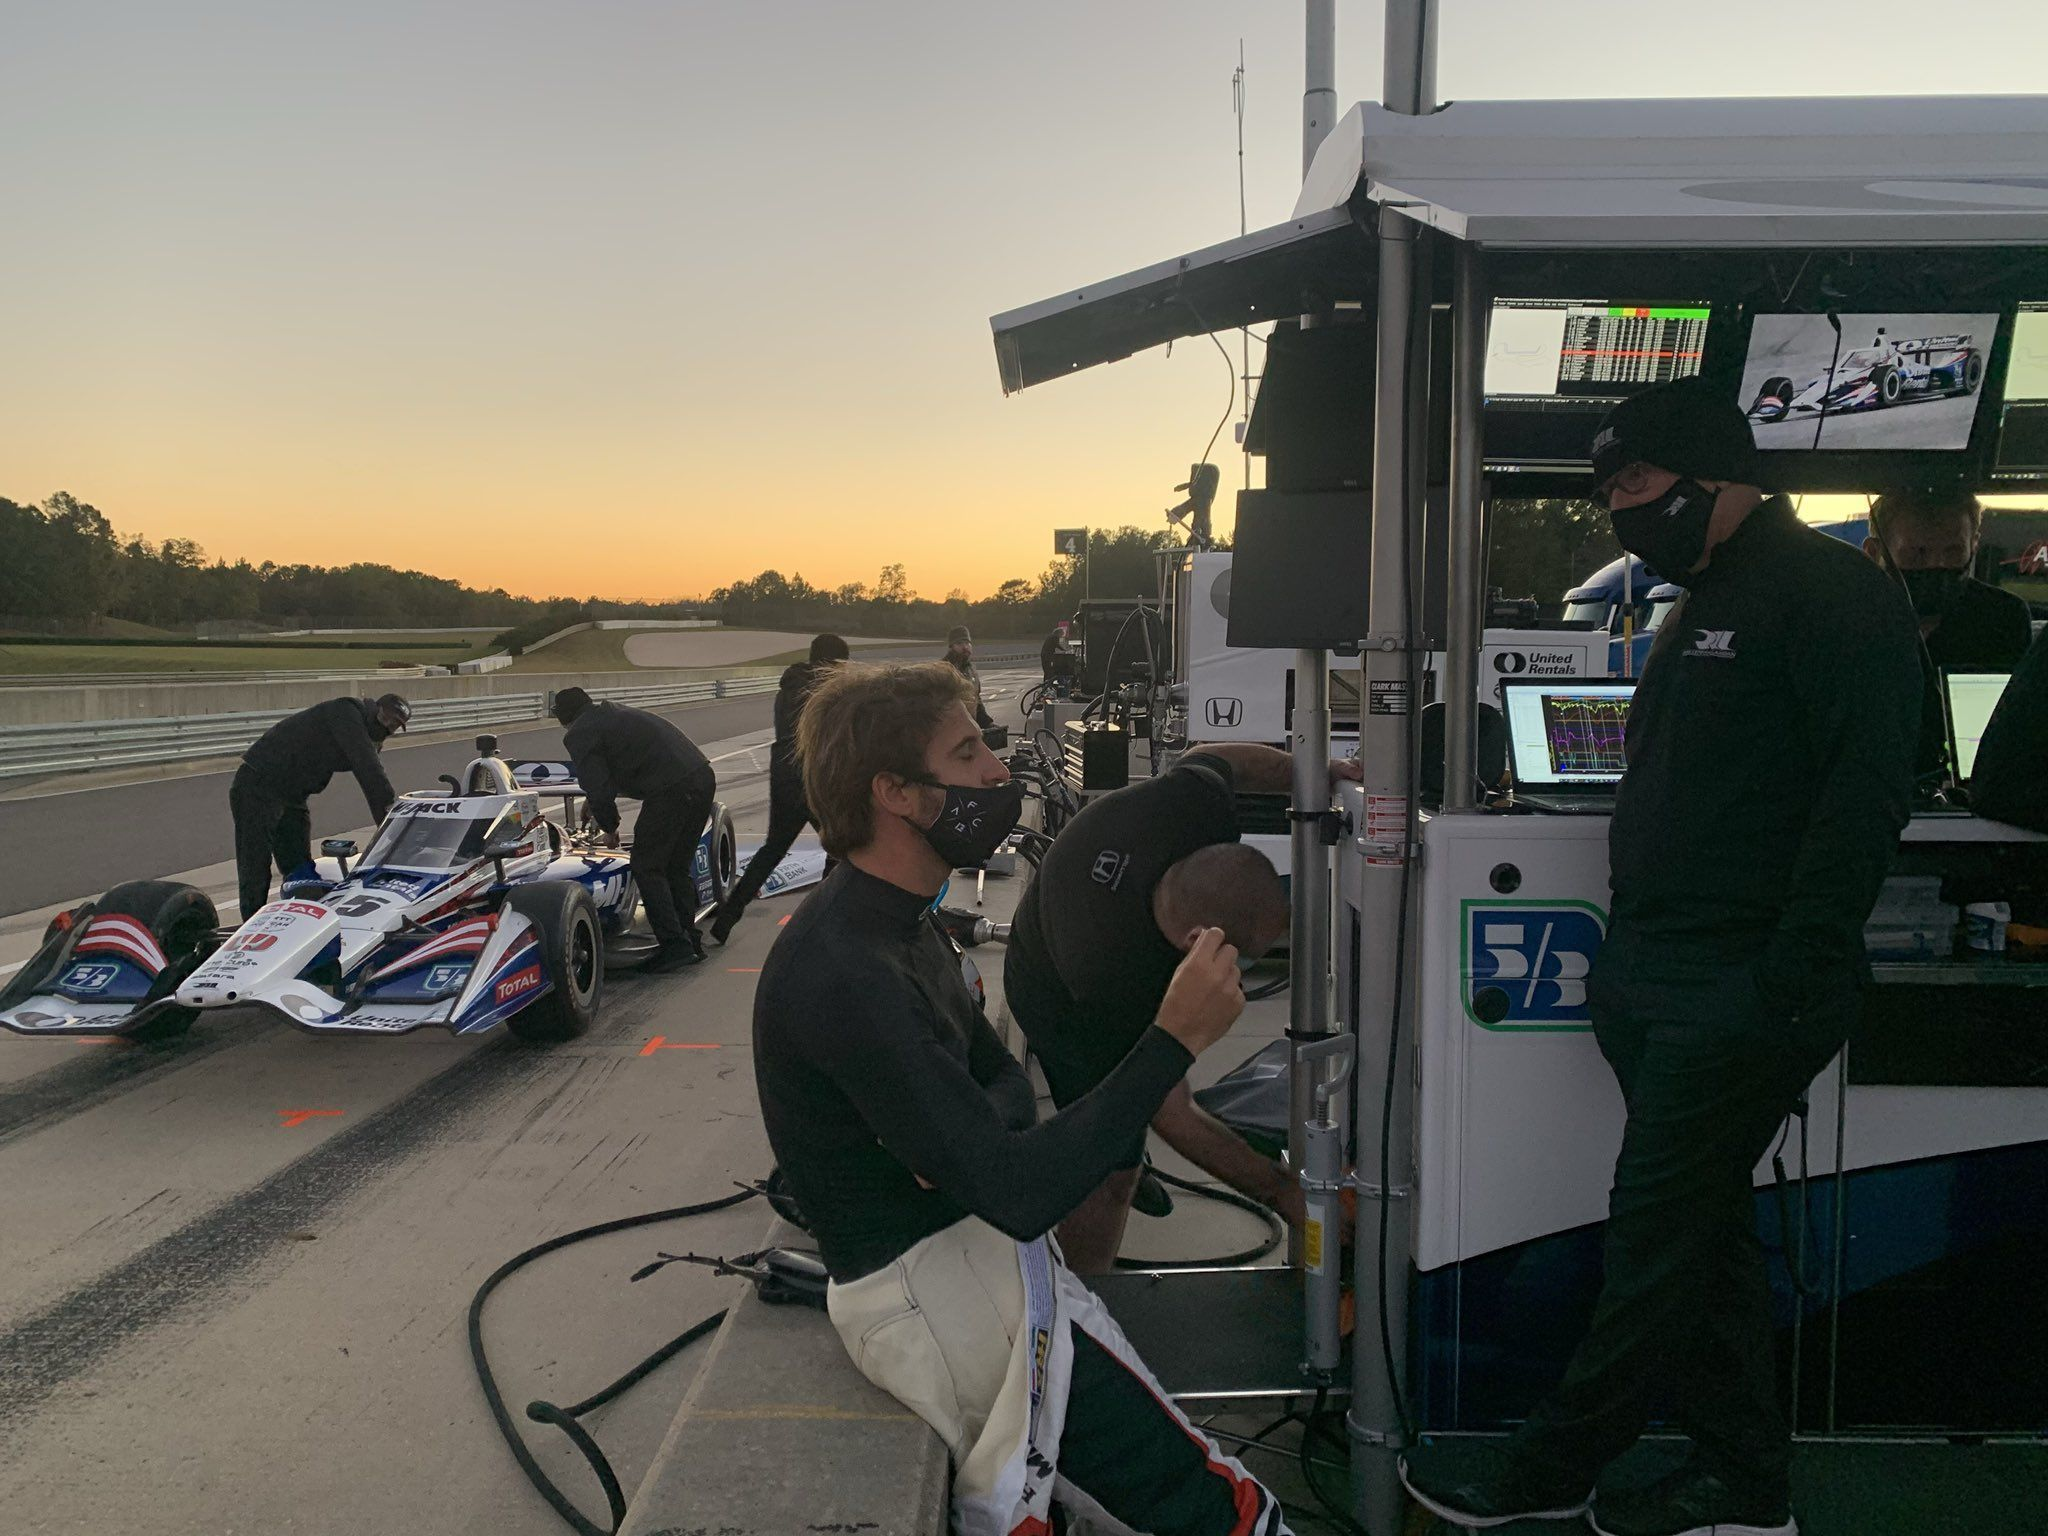 Antonio Felix Da Costa, Jimmie Johnson, IndyCar